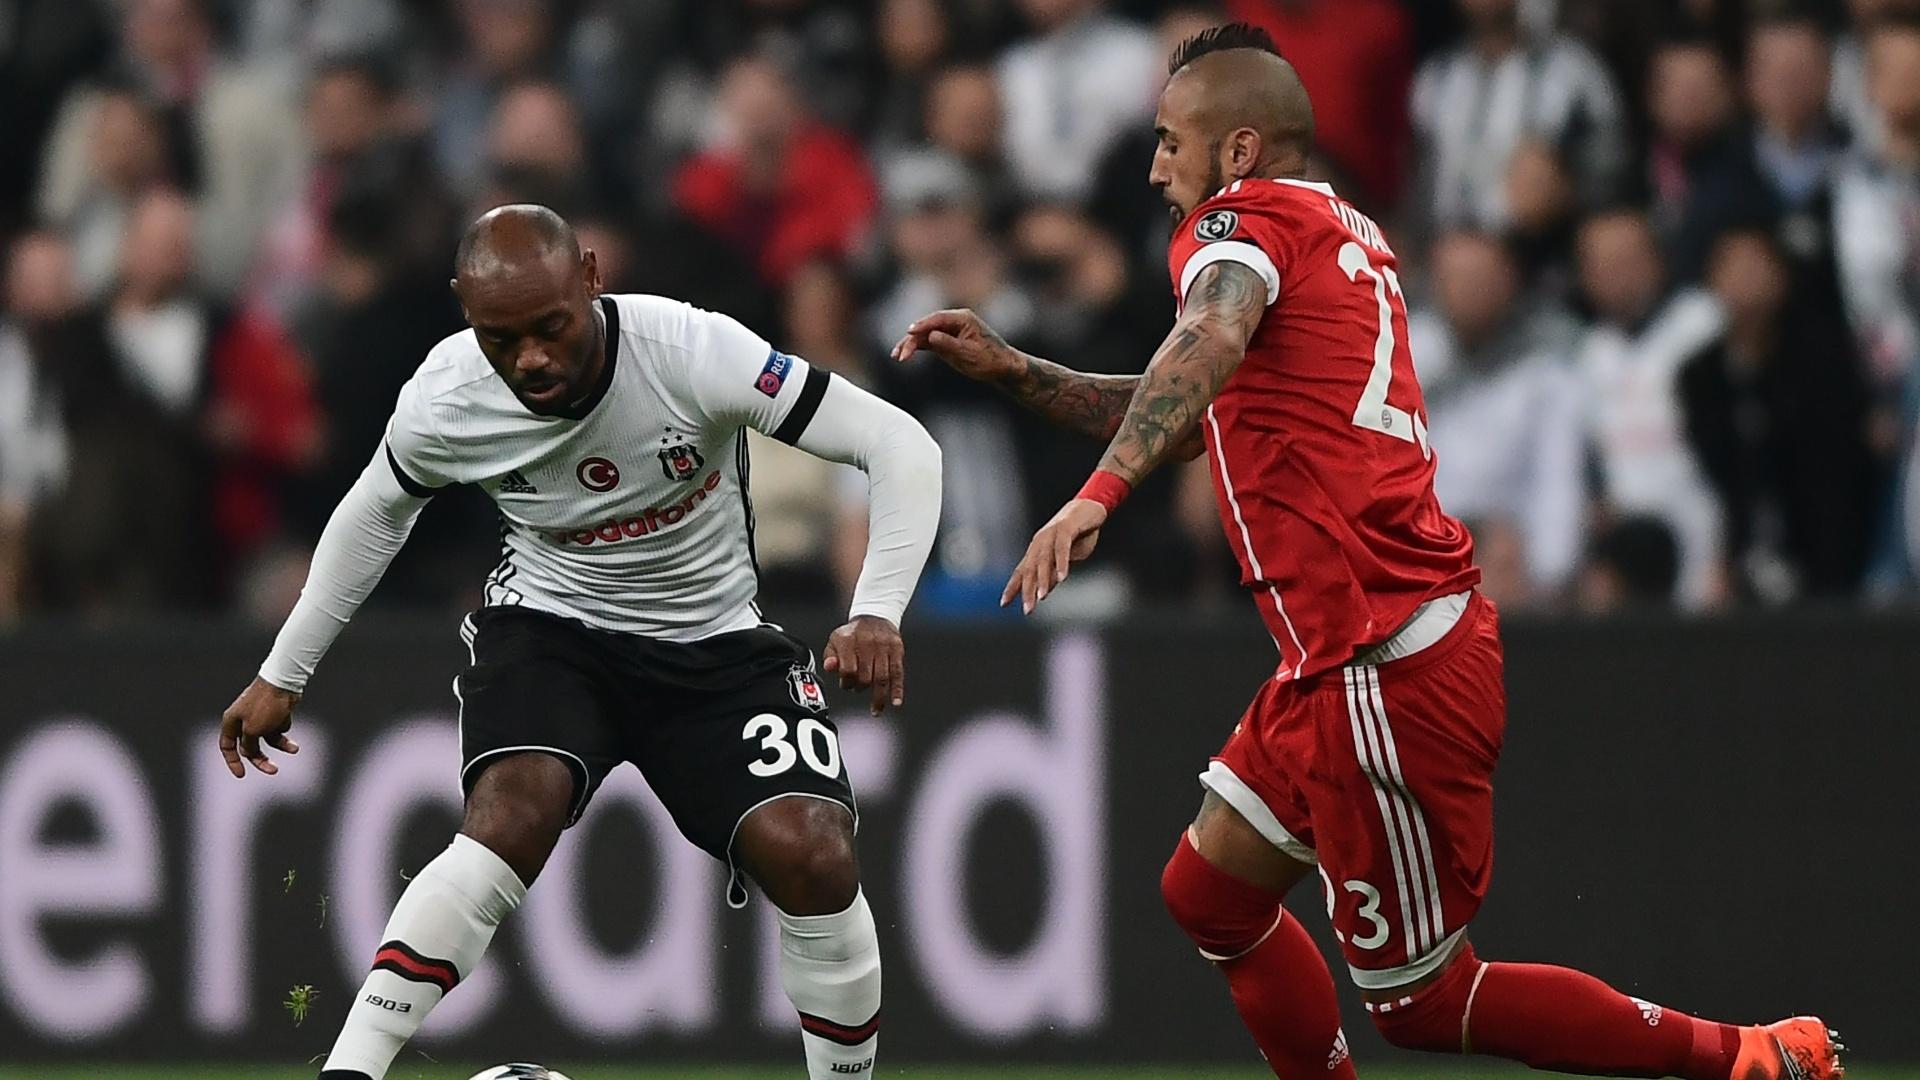 Vagner Love disputa jogada com Vidal